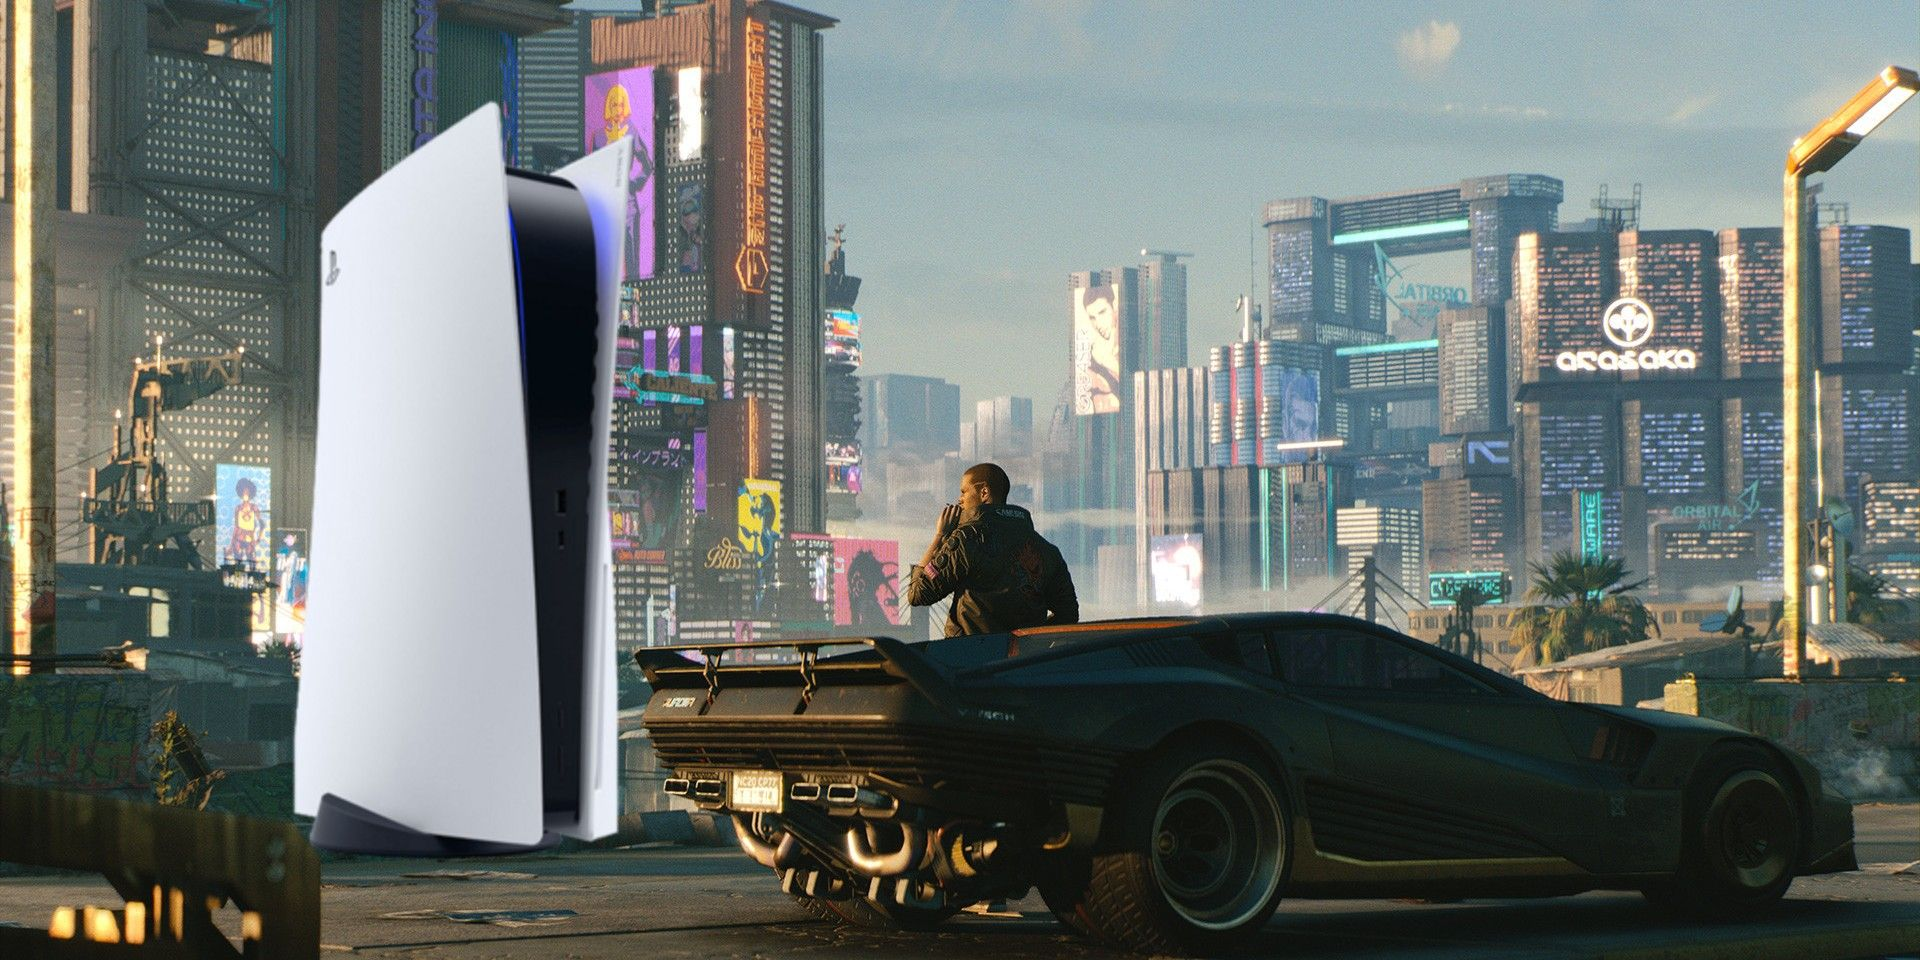 The PlayStation 5 is brilliantly portrayed as a Cyberpunk skyscraper